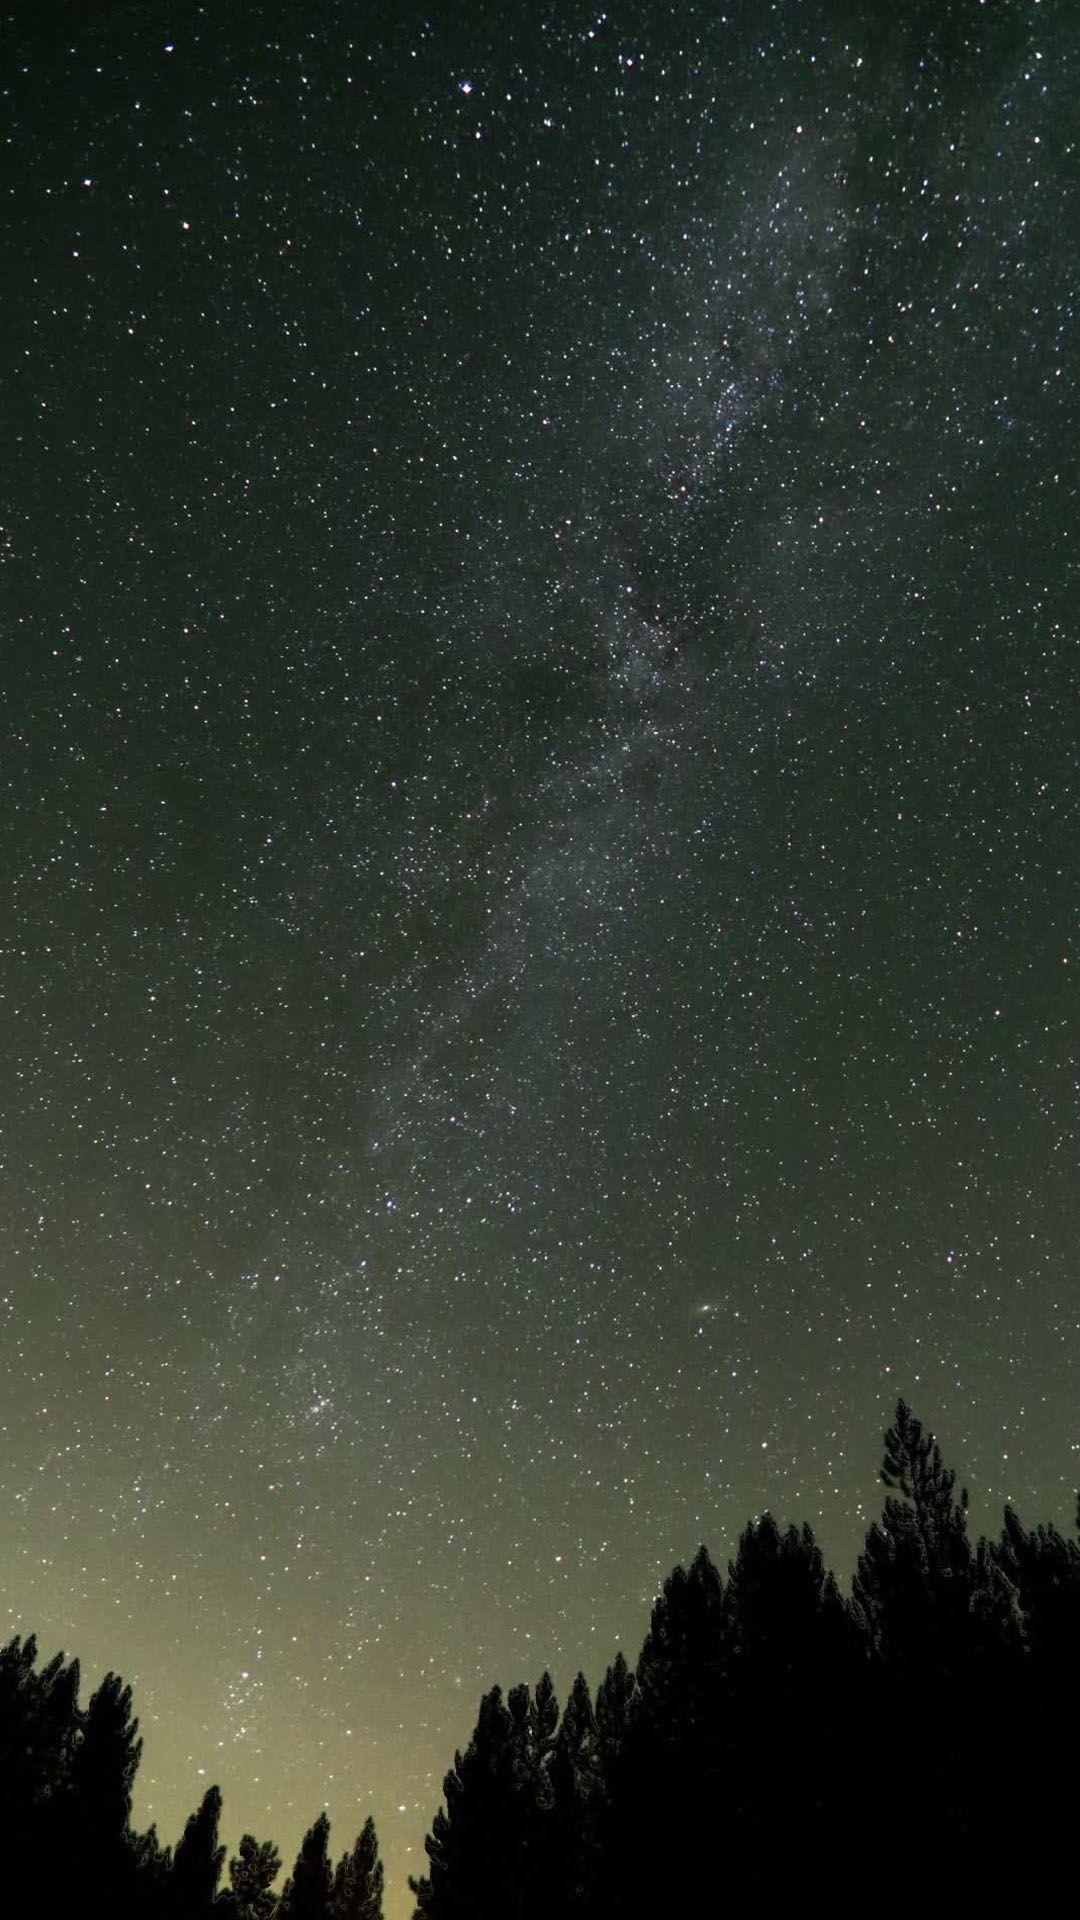 Nature starry night sky HD Samsung S4 wallpaper 1080x1920